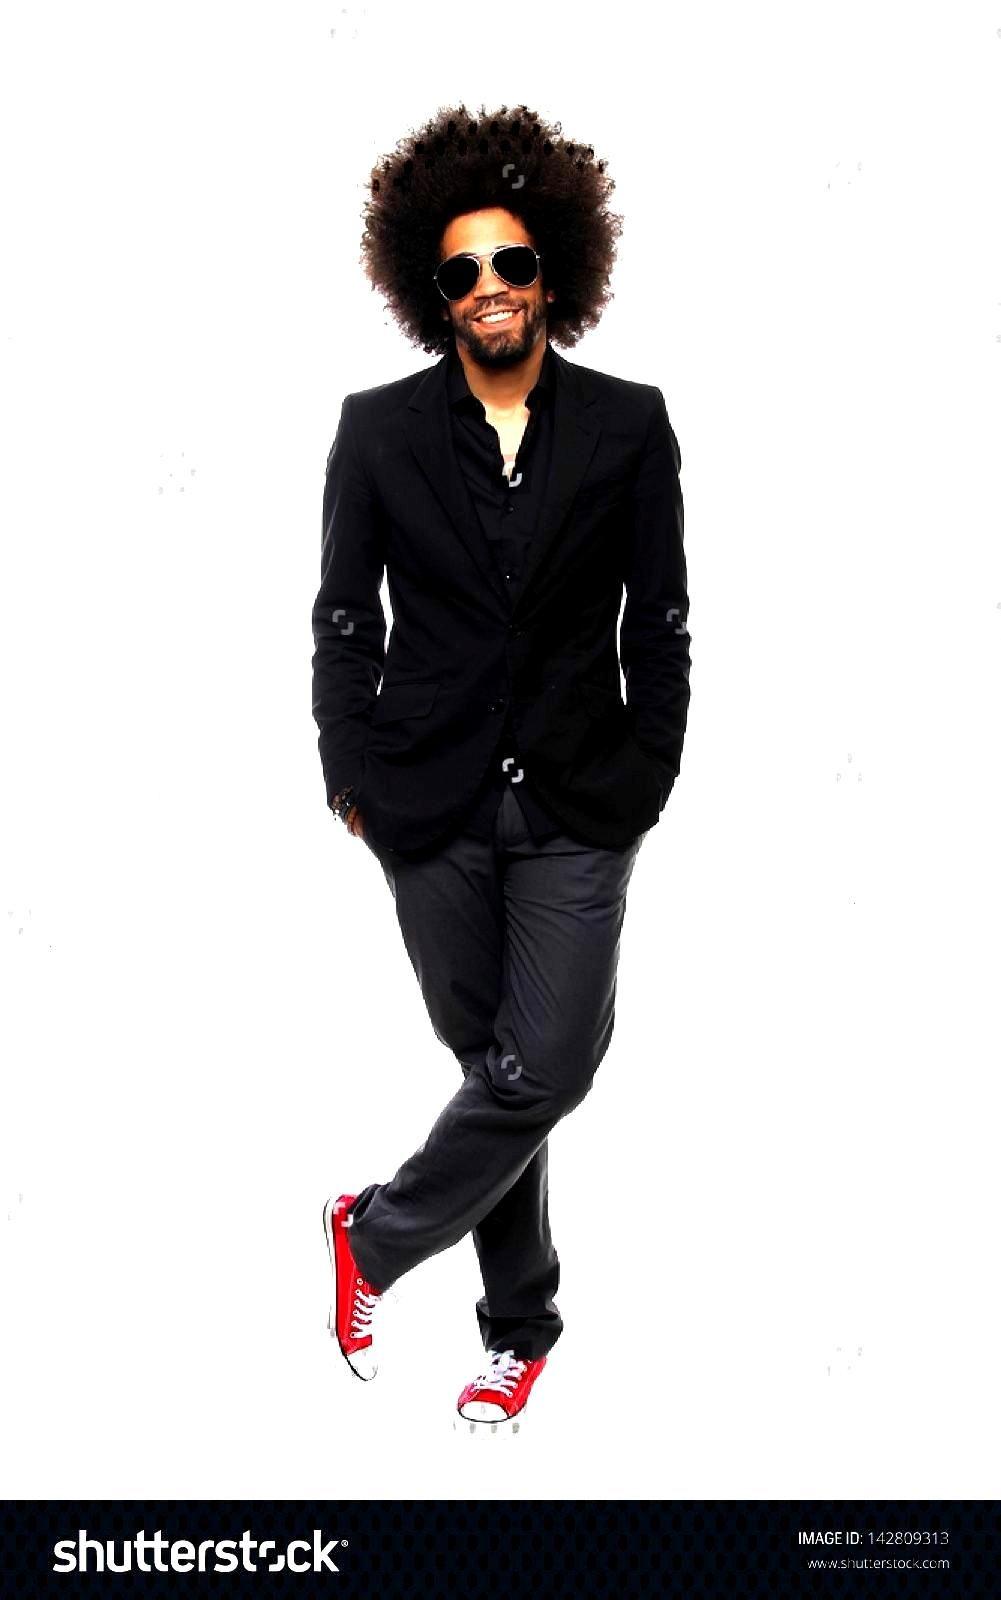 Man with an afro posing ,Man with an afro posing ,Man with an afro posing ,